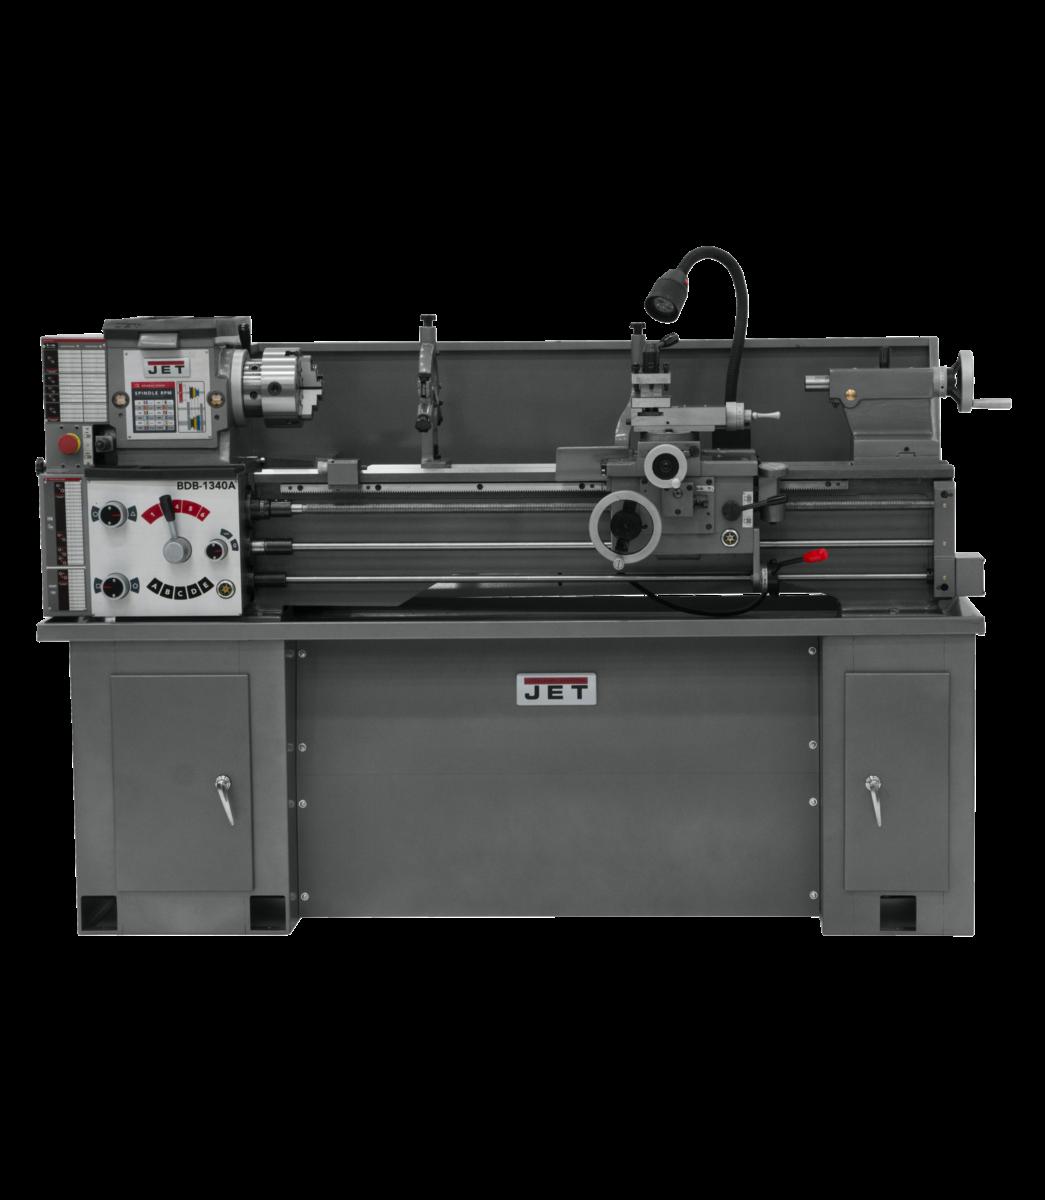 BDB-1340A With Newall DP700 DRO